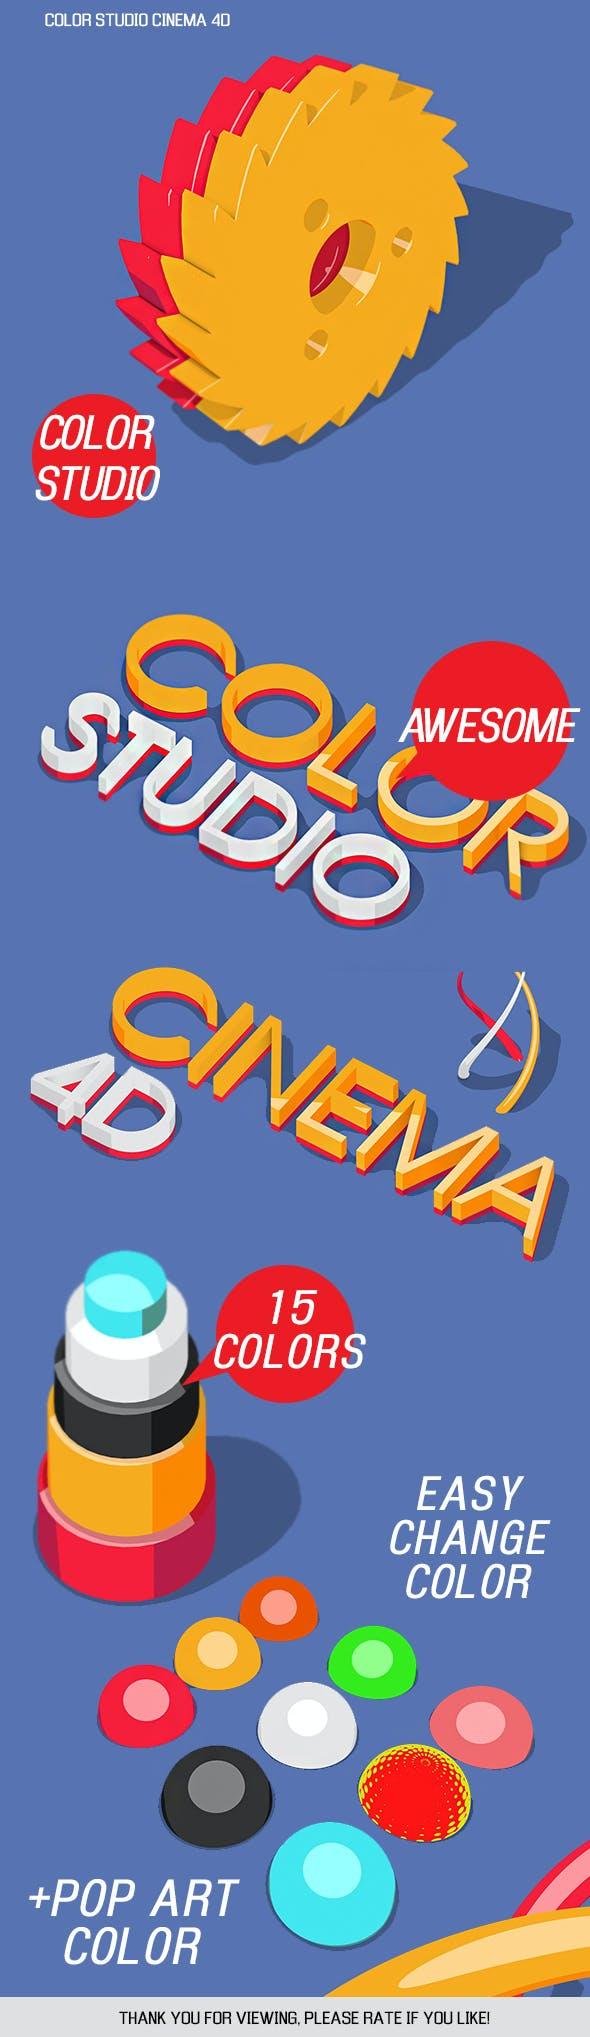 Color studio cinema 4D - 3DOcean Item for Sale